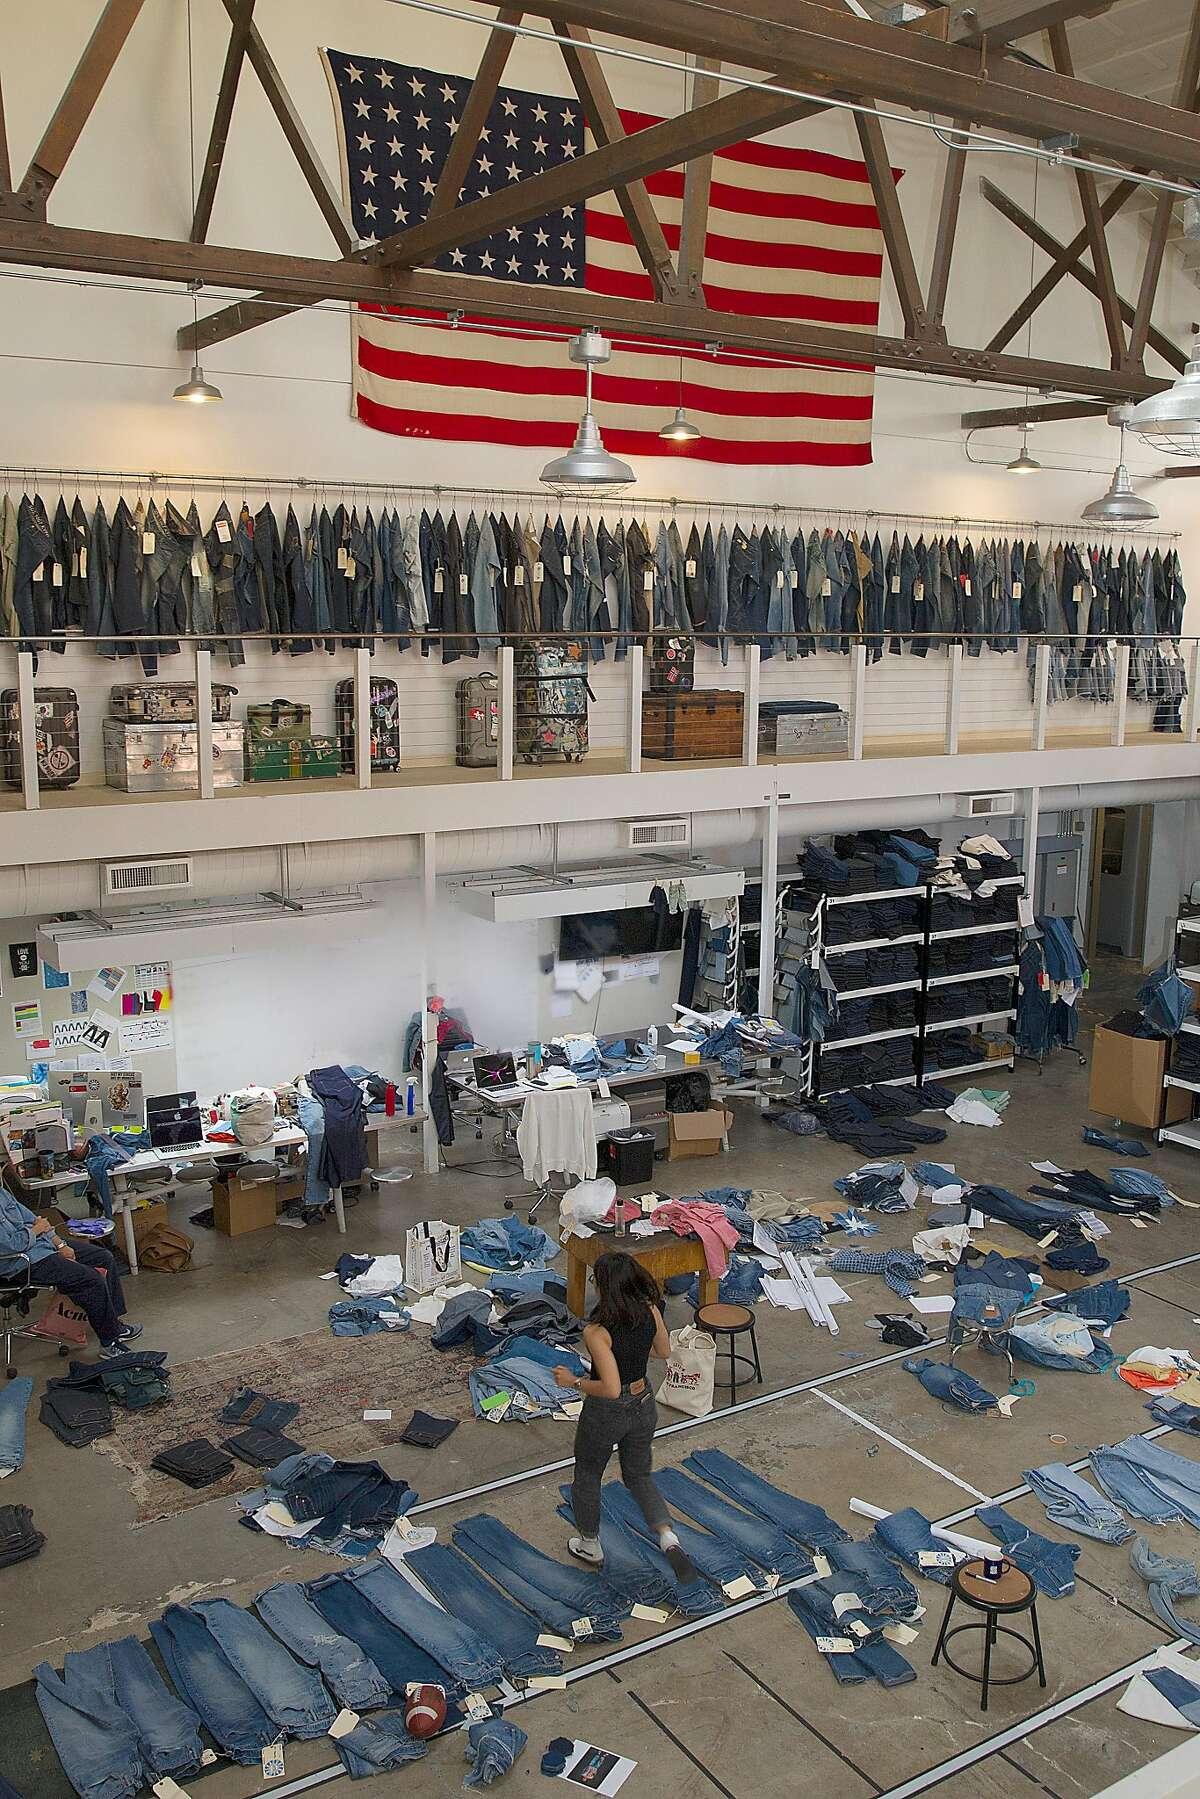 Levi's innovation lab on Thursday, September 21, 2017, in San Francisco, Calif.